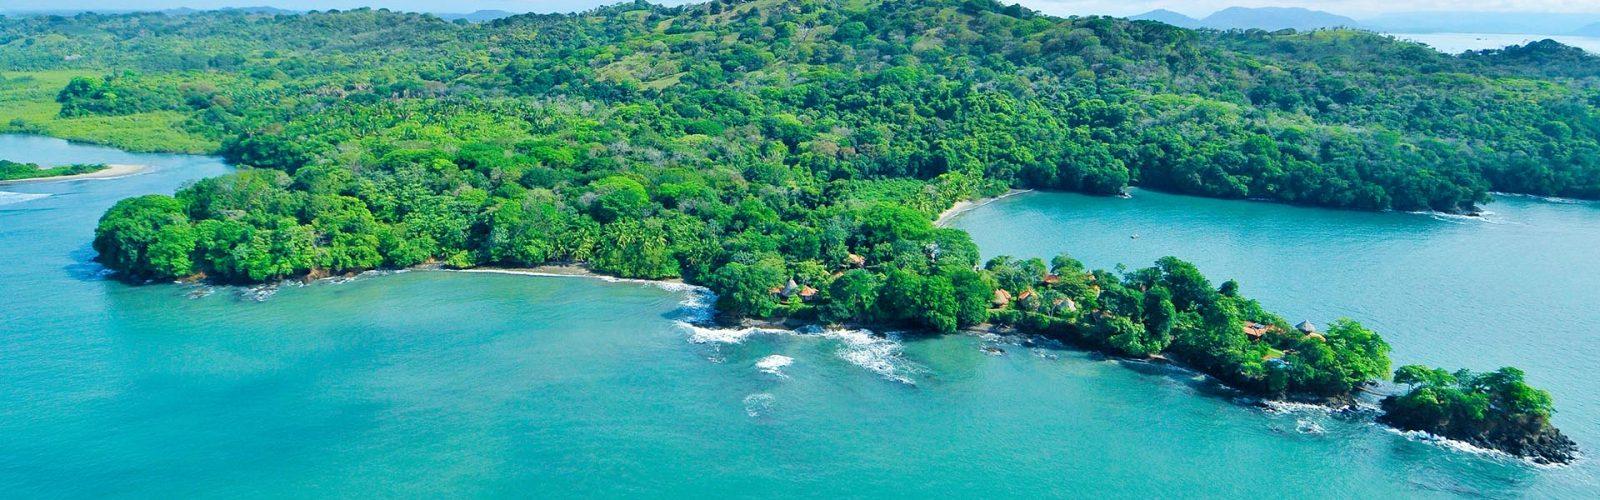 Cala Mia Island Resort in Panama